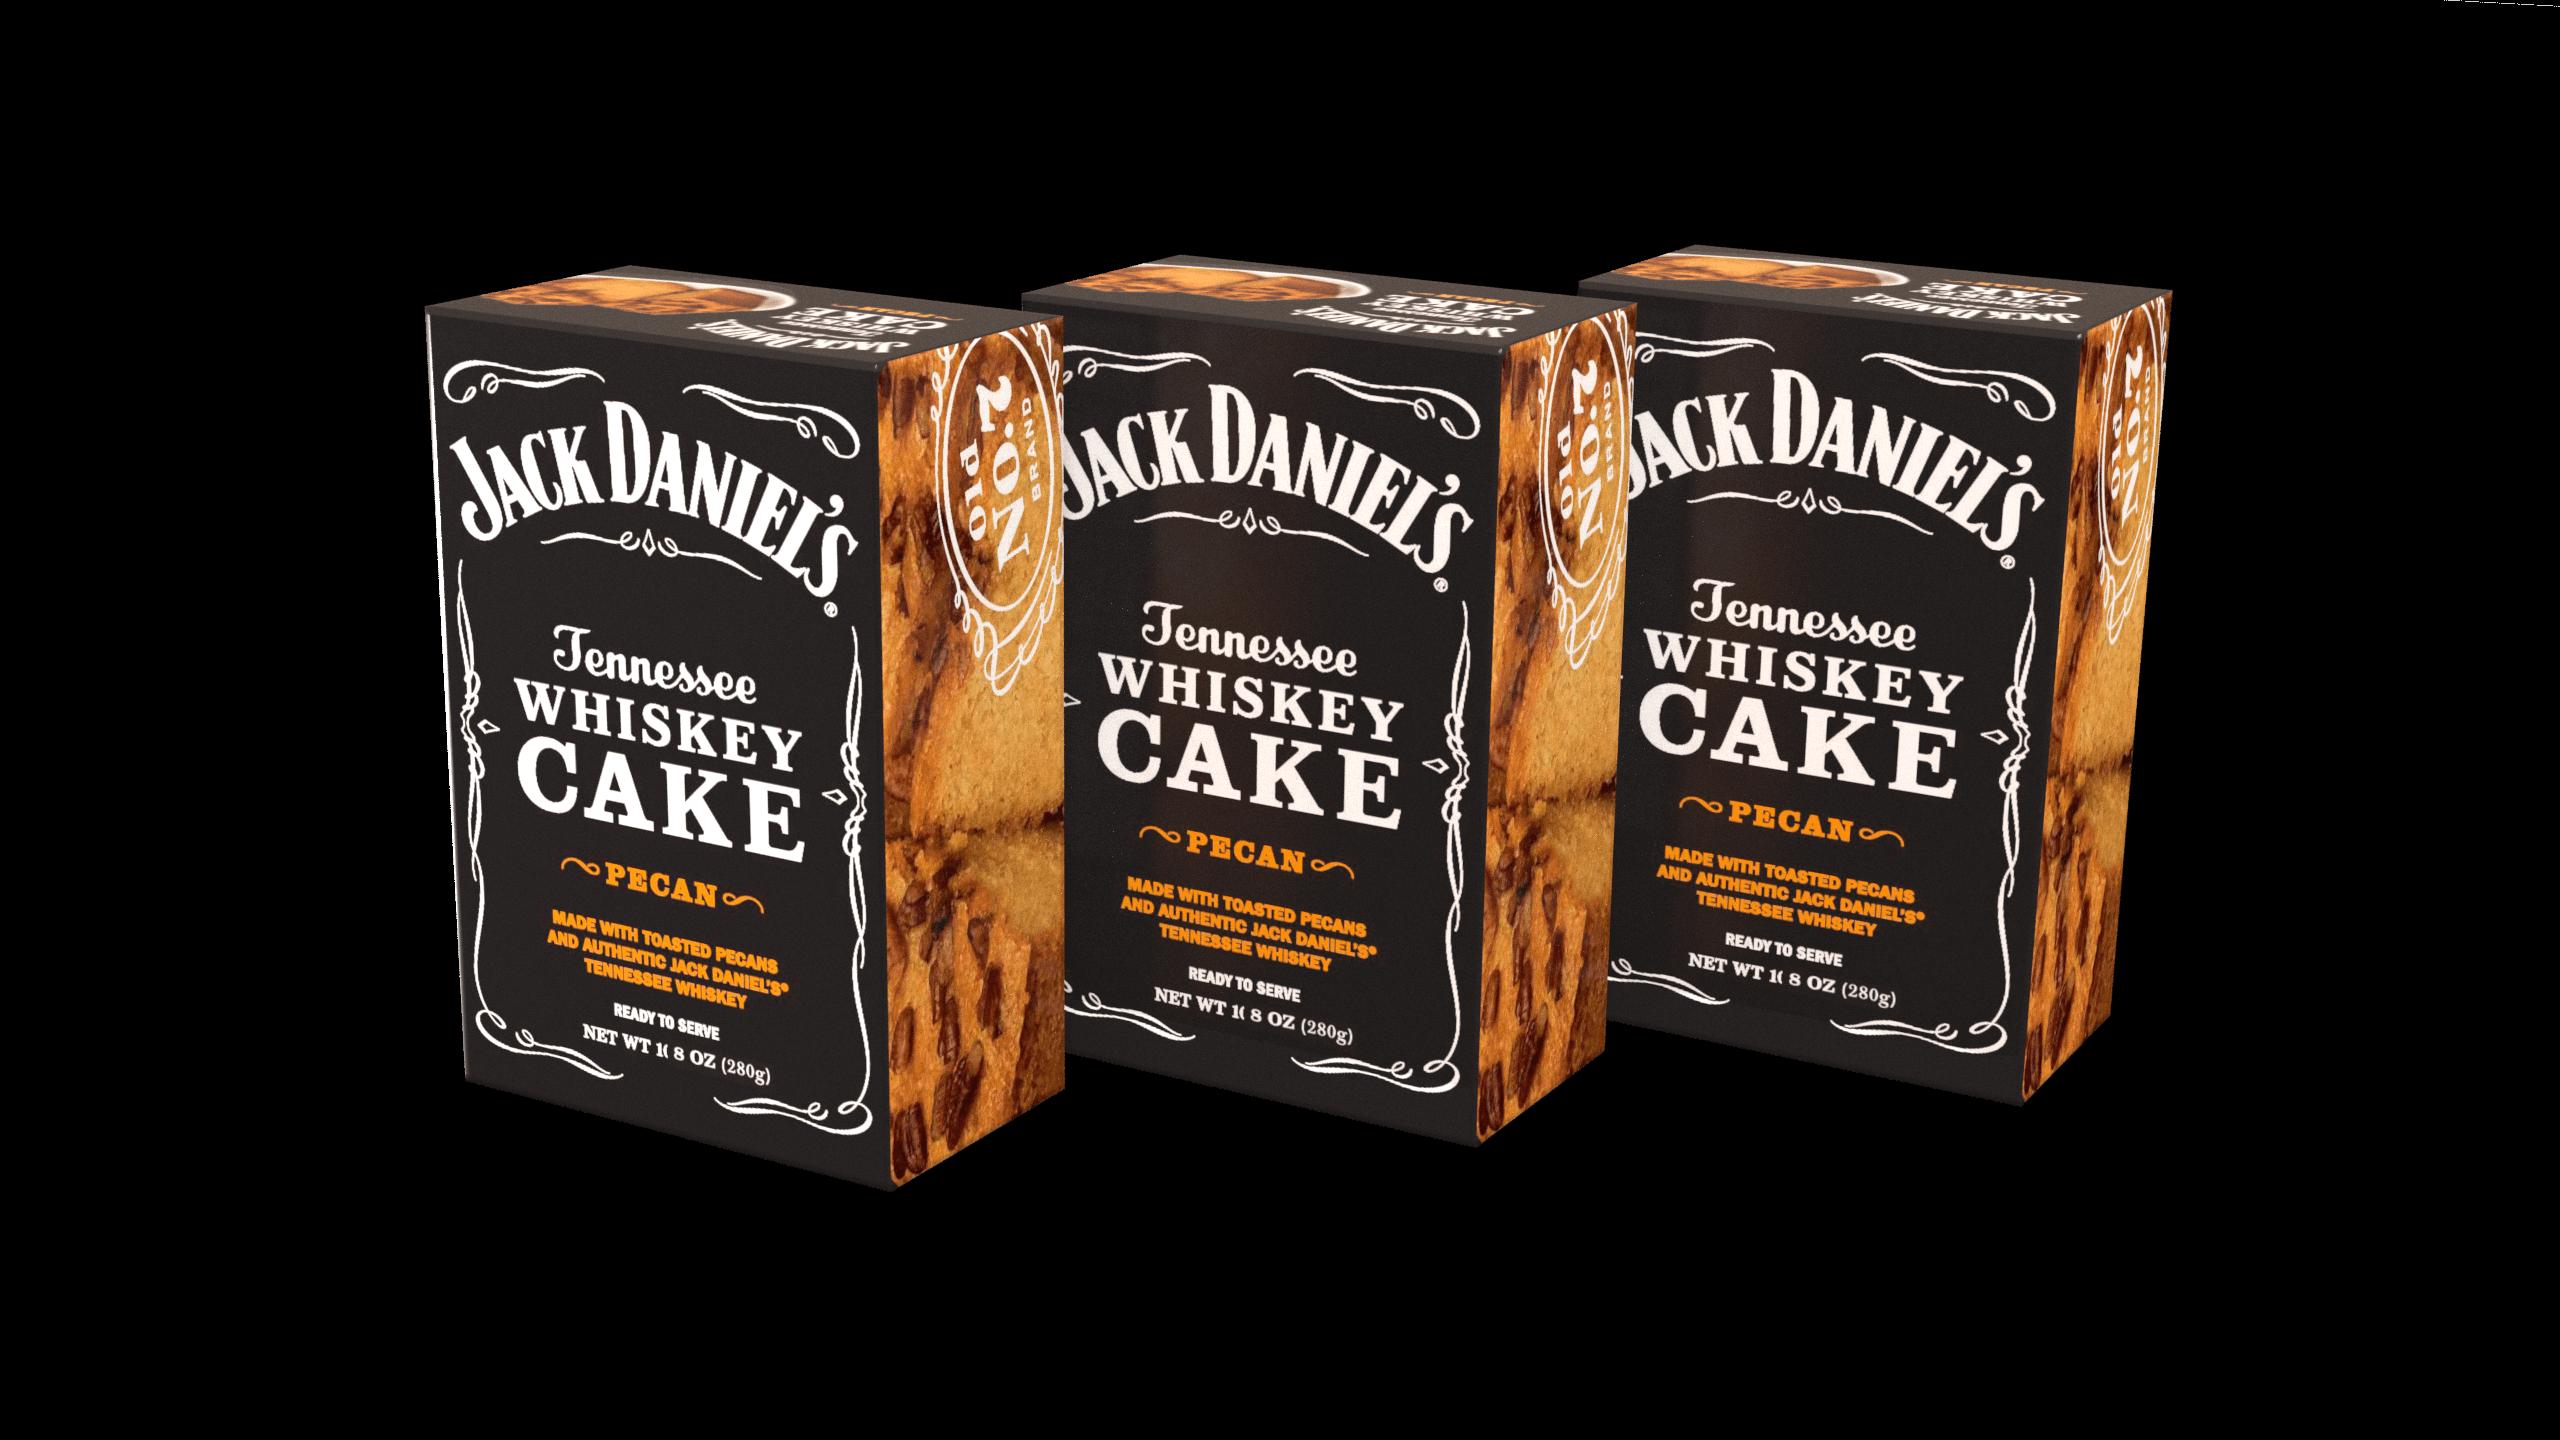 3-Pack of Jack Daniel's Tennessee Whiskey Cake - Pecan JD308PCN